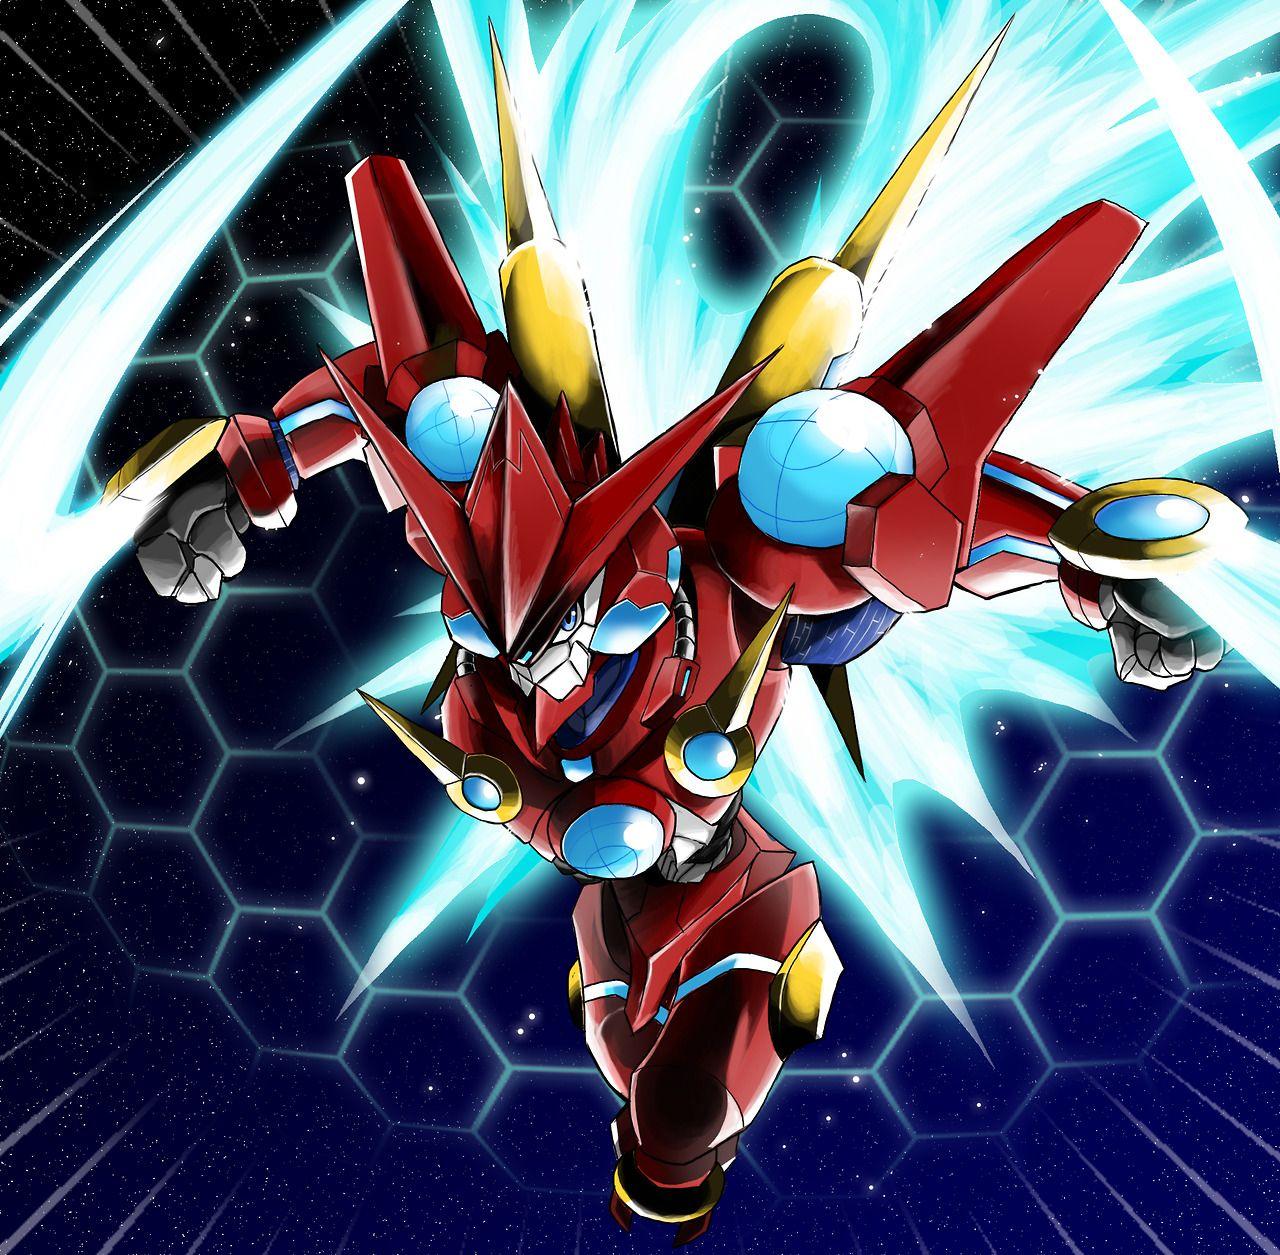 Globemon Credits To The Artist Digimon Digimon Digital Monsters Digimon Universe Appli Monsters